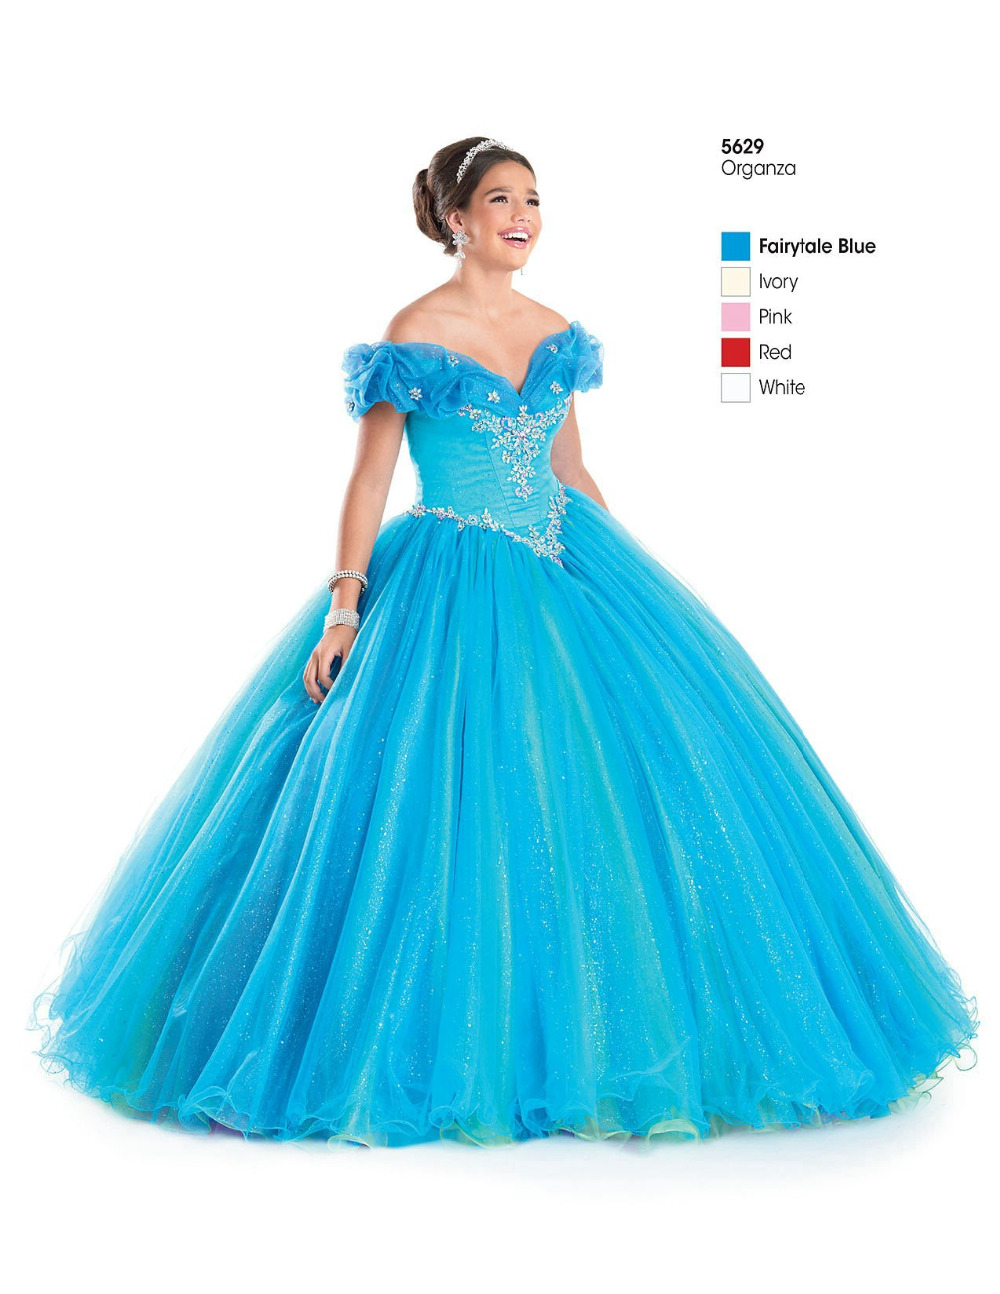 Emejing Fairytale Prom Dresses Images - Styles & Ideas 2018 - sperr.us